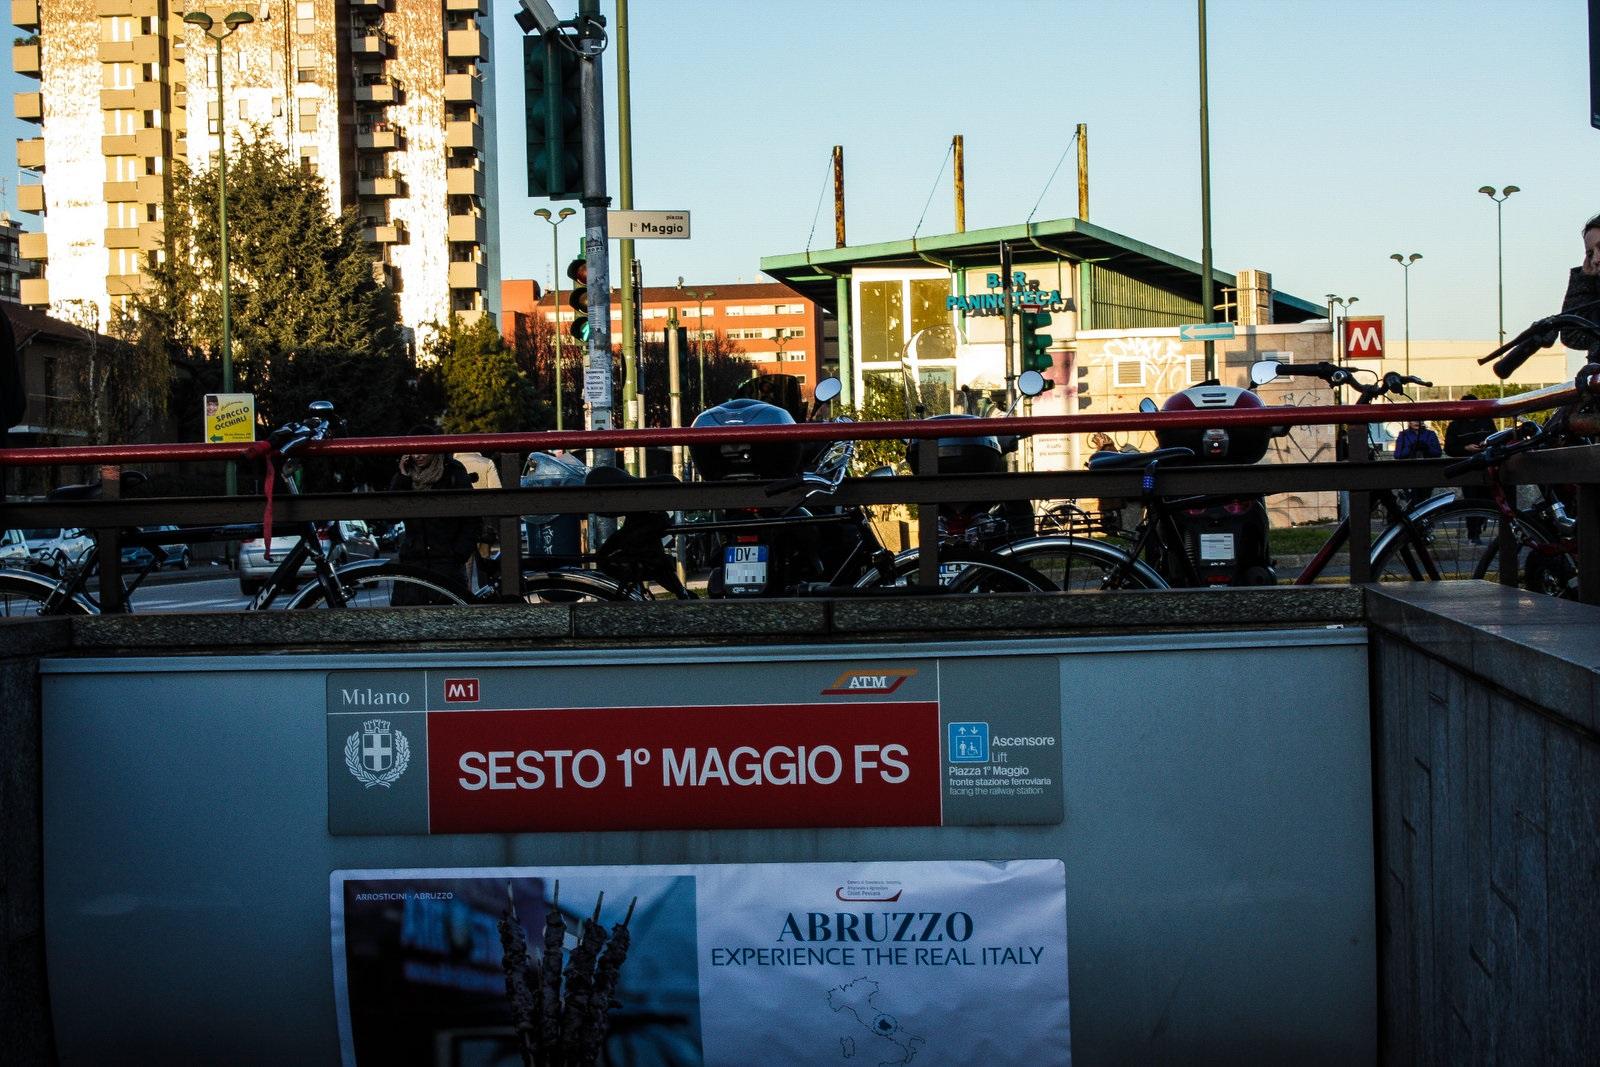 Ingresso stazione M1 - Sesto FS